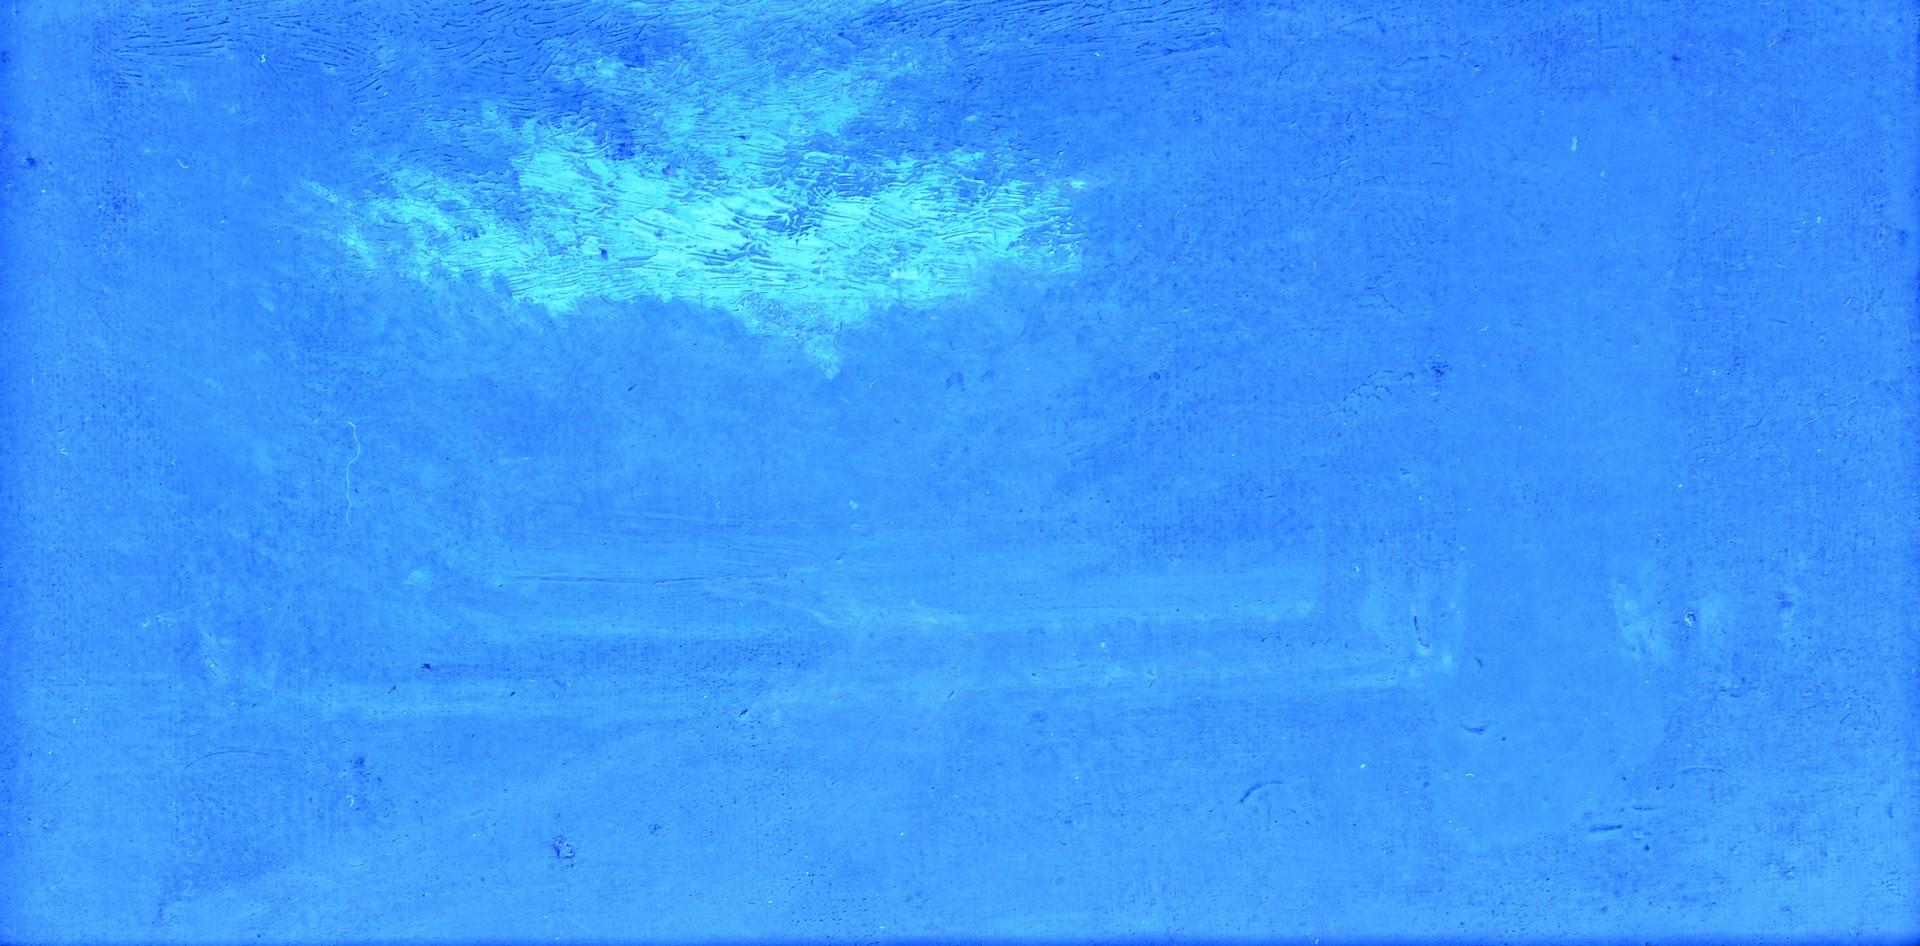 Lot 206: Harvey Joiner Small Landscape